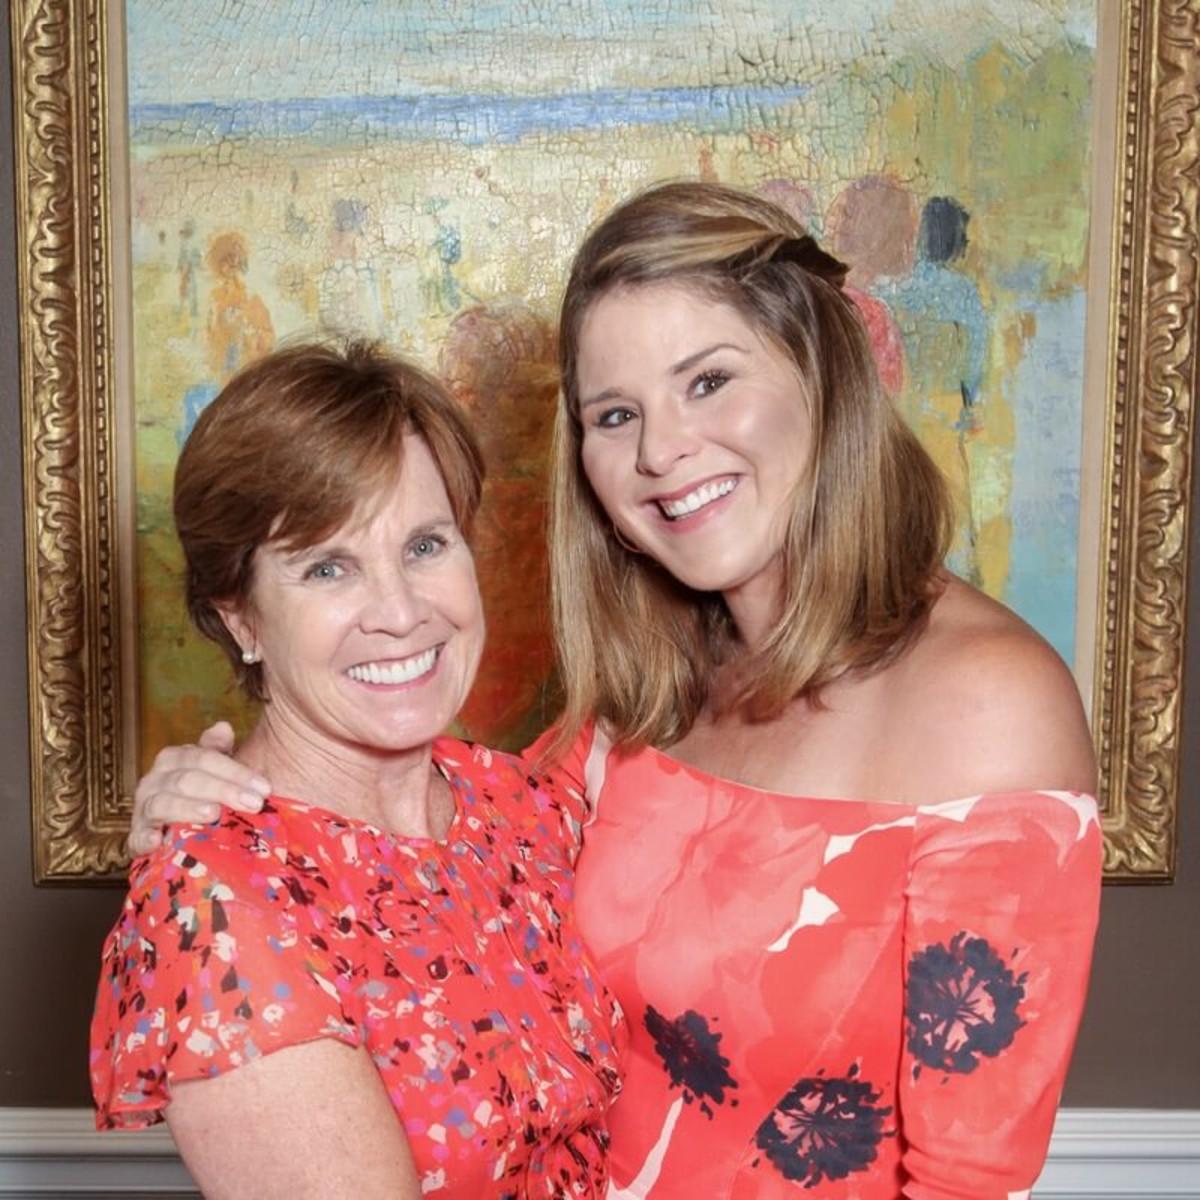 Mental Health Association luncheon, 9/16 Maureen Hackett, Jenna Bush Hager